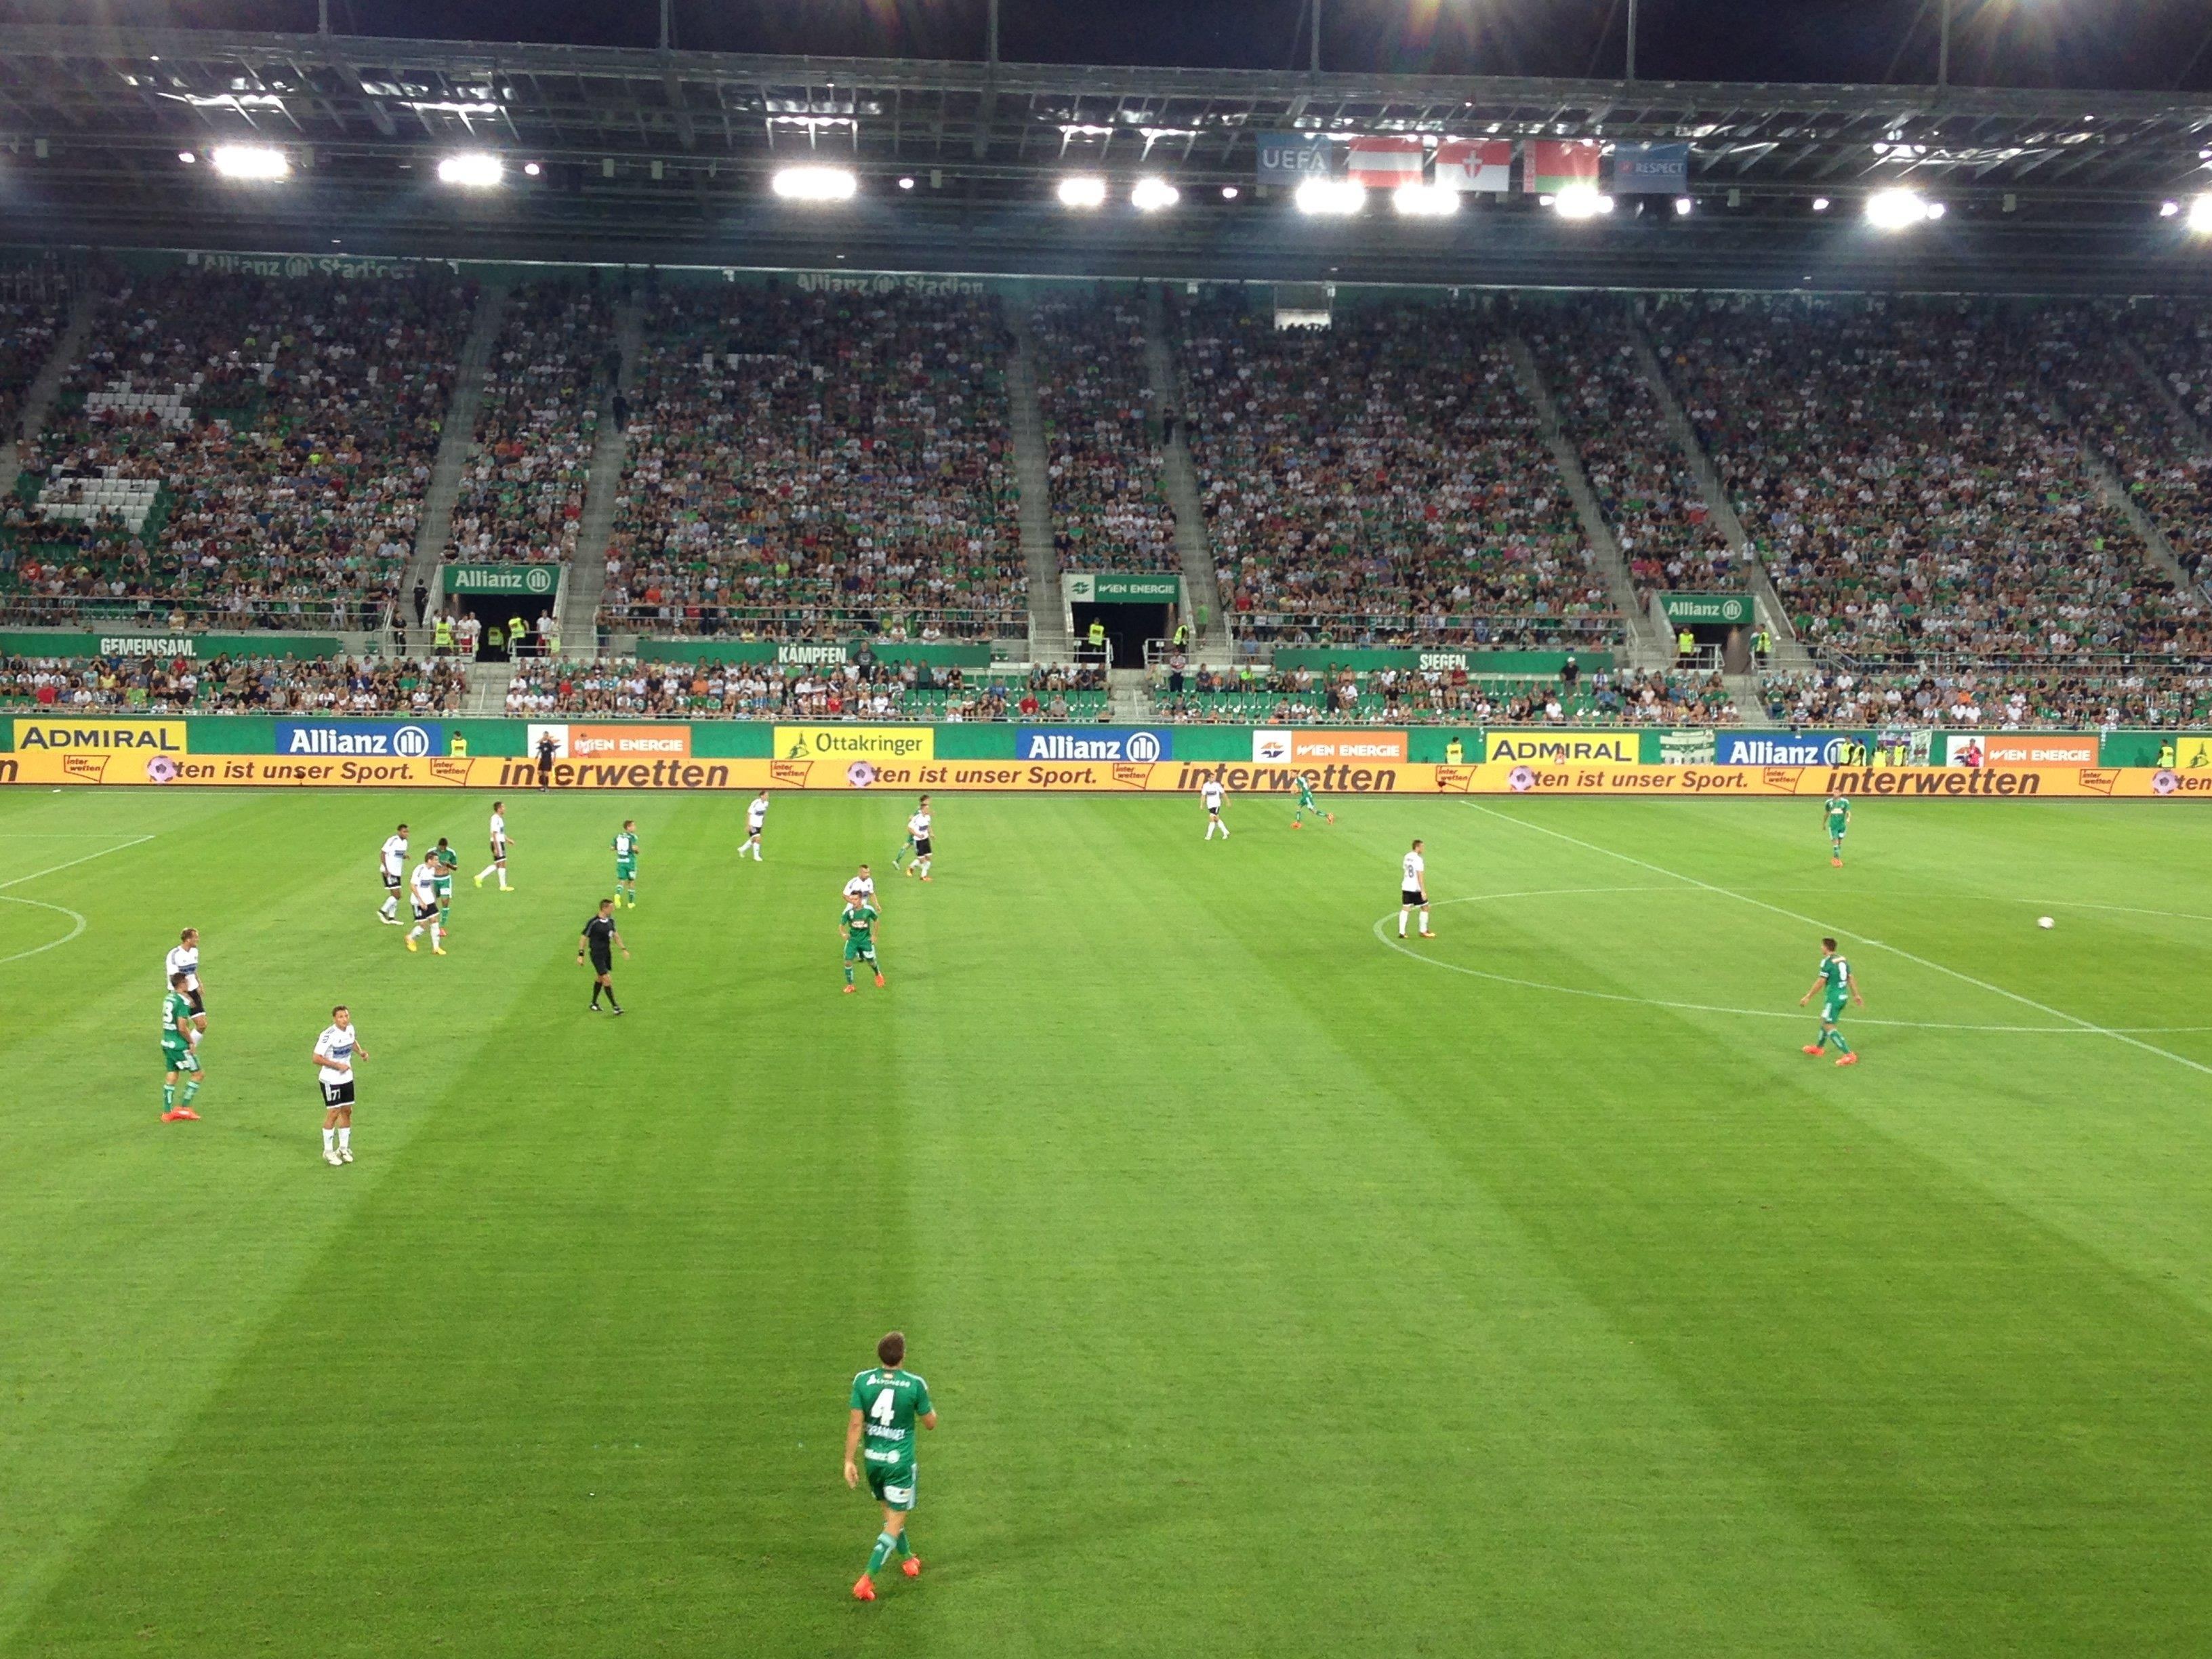 Rapid Wien gegen Torpedo Schodsina live aus dem Allianz-Stadion.